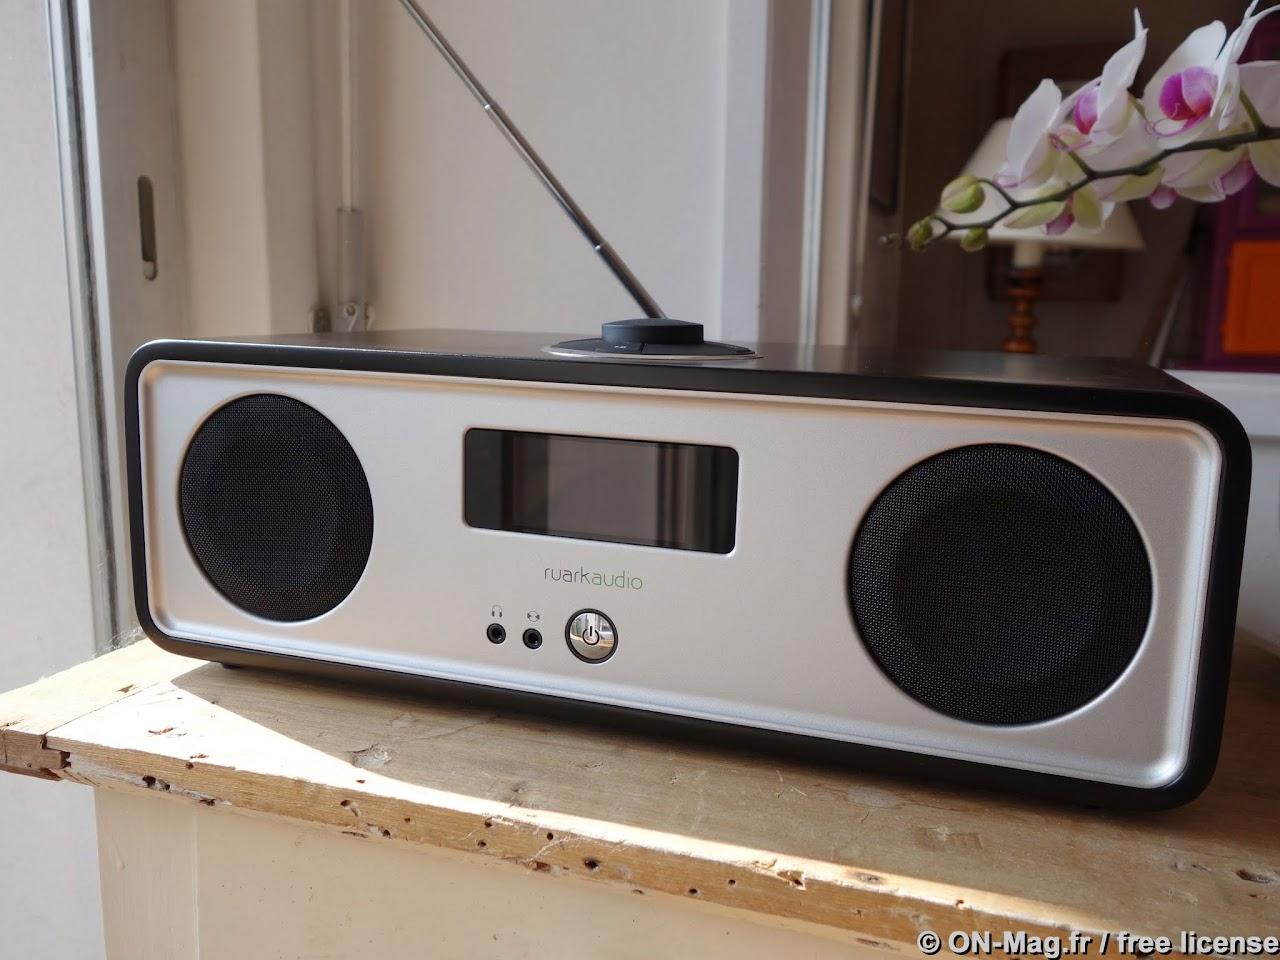 Les spécifications de la Ruark Audio R2 mk3